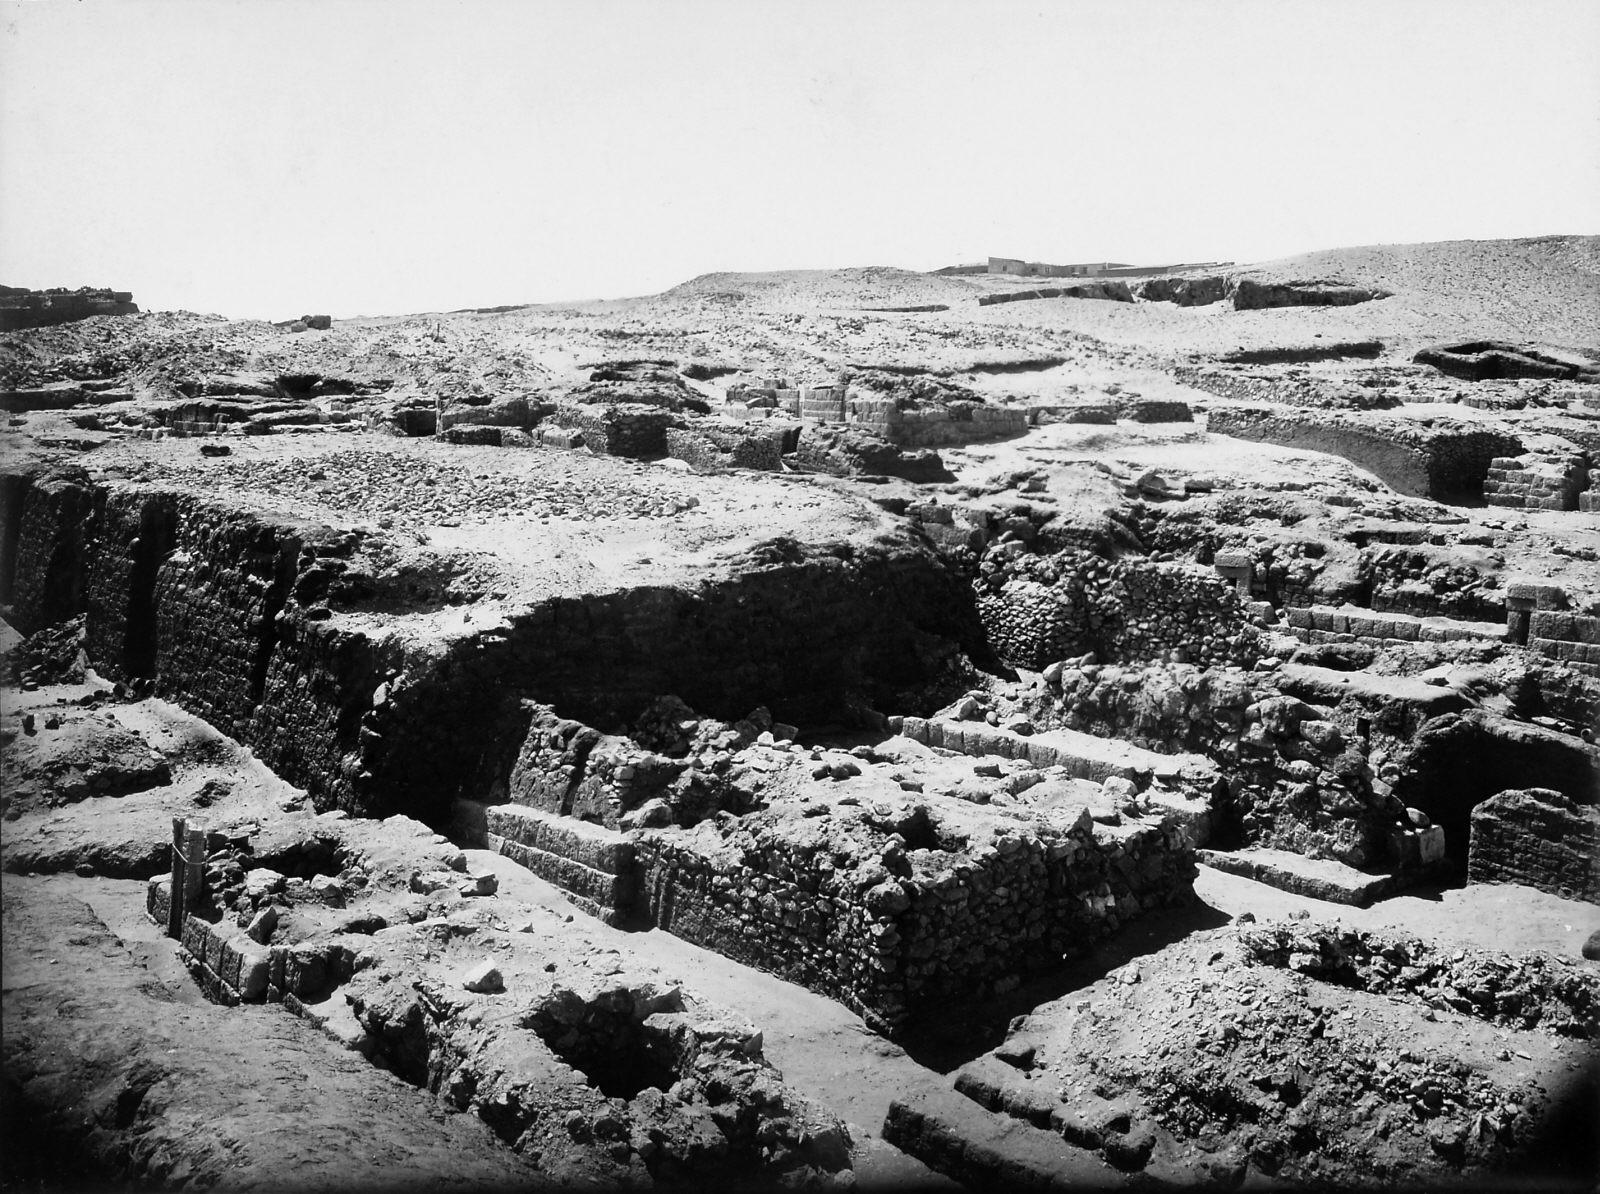 Western Cemetery: Site: Giza; View: S 4370/4378, Hetepkhnemet, S 4285/4287, S 4380, S 4373/4379